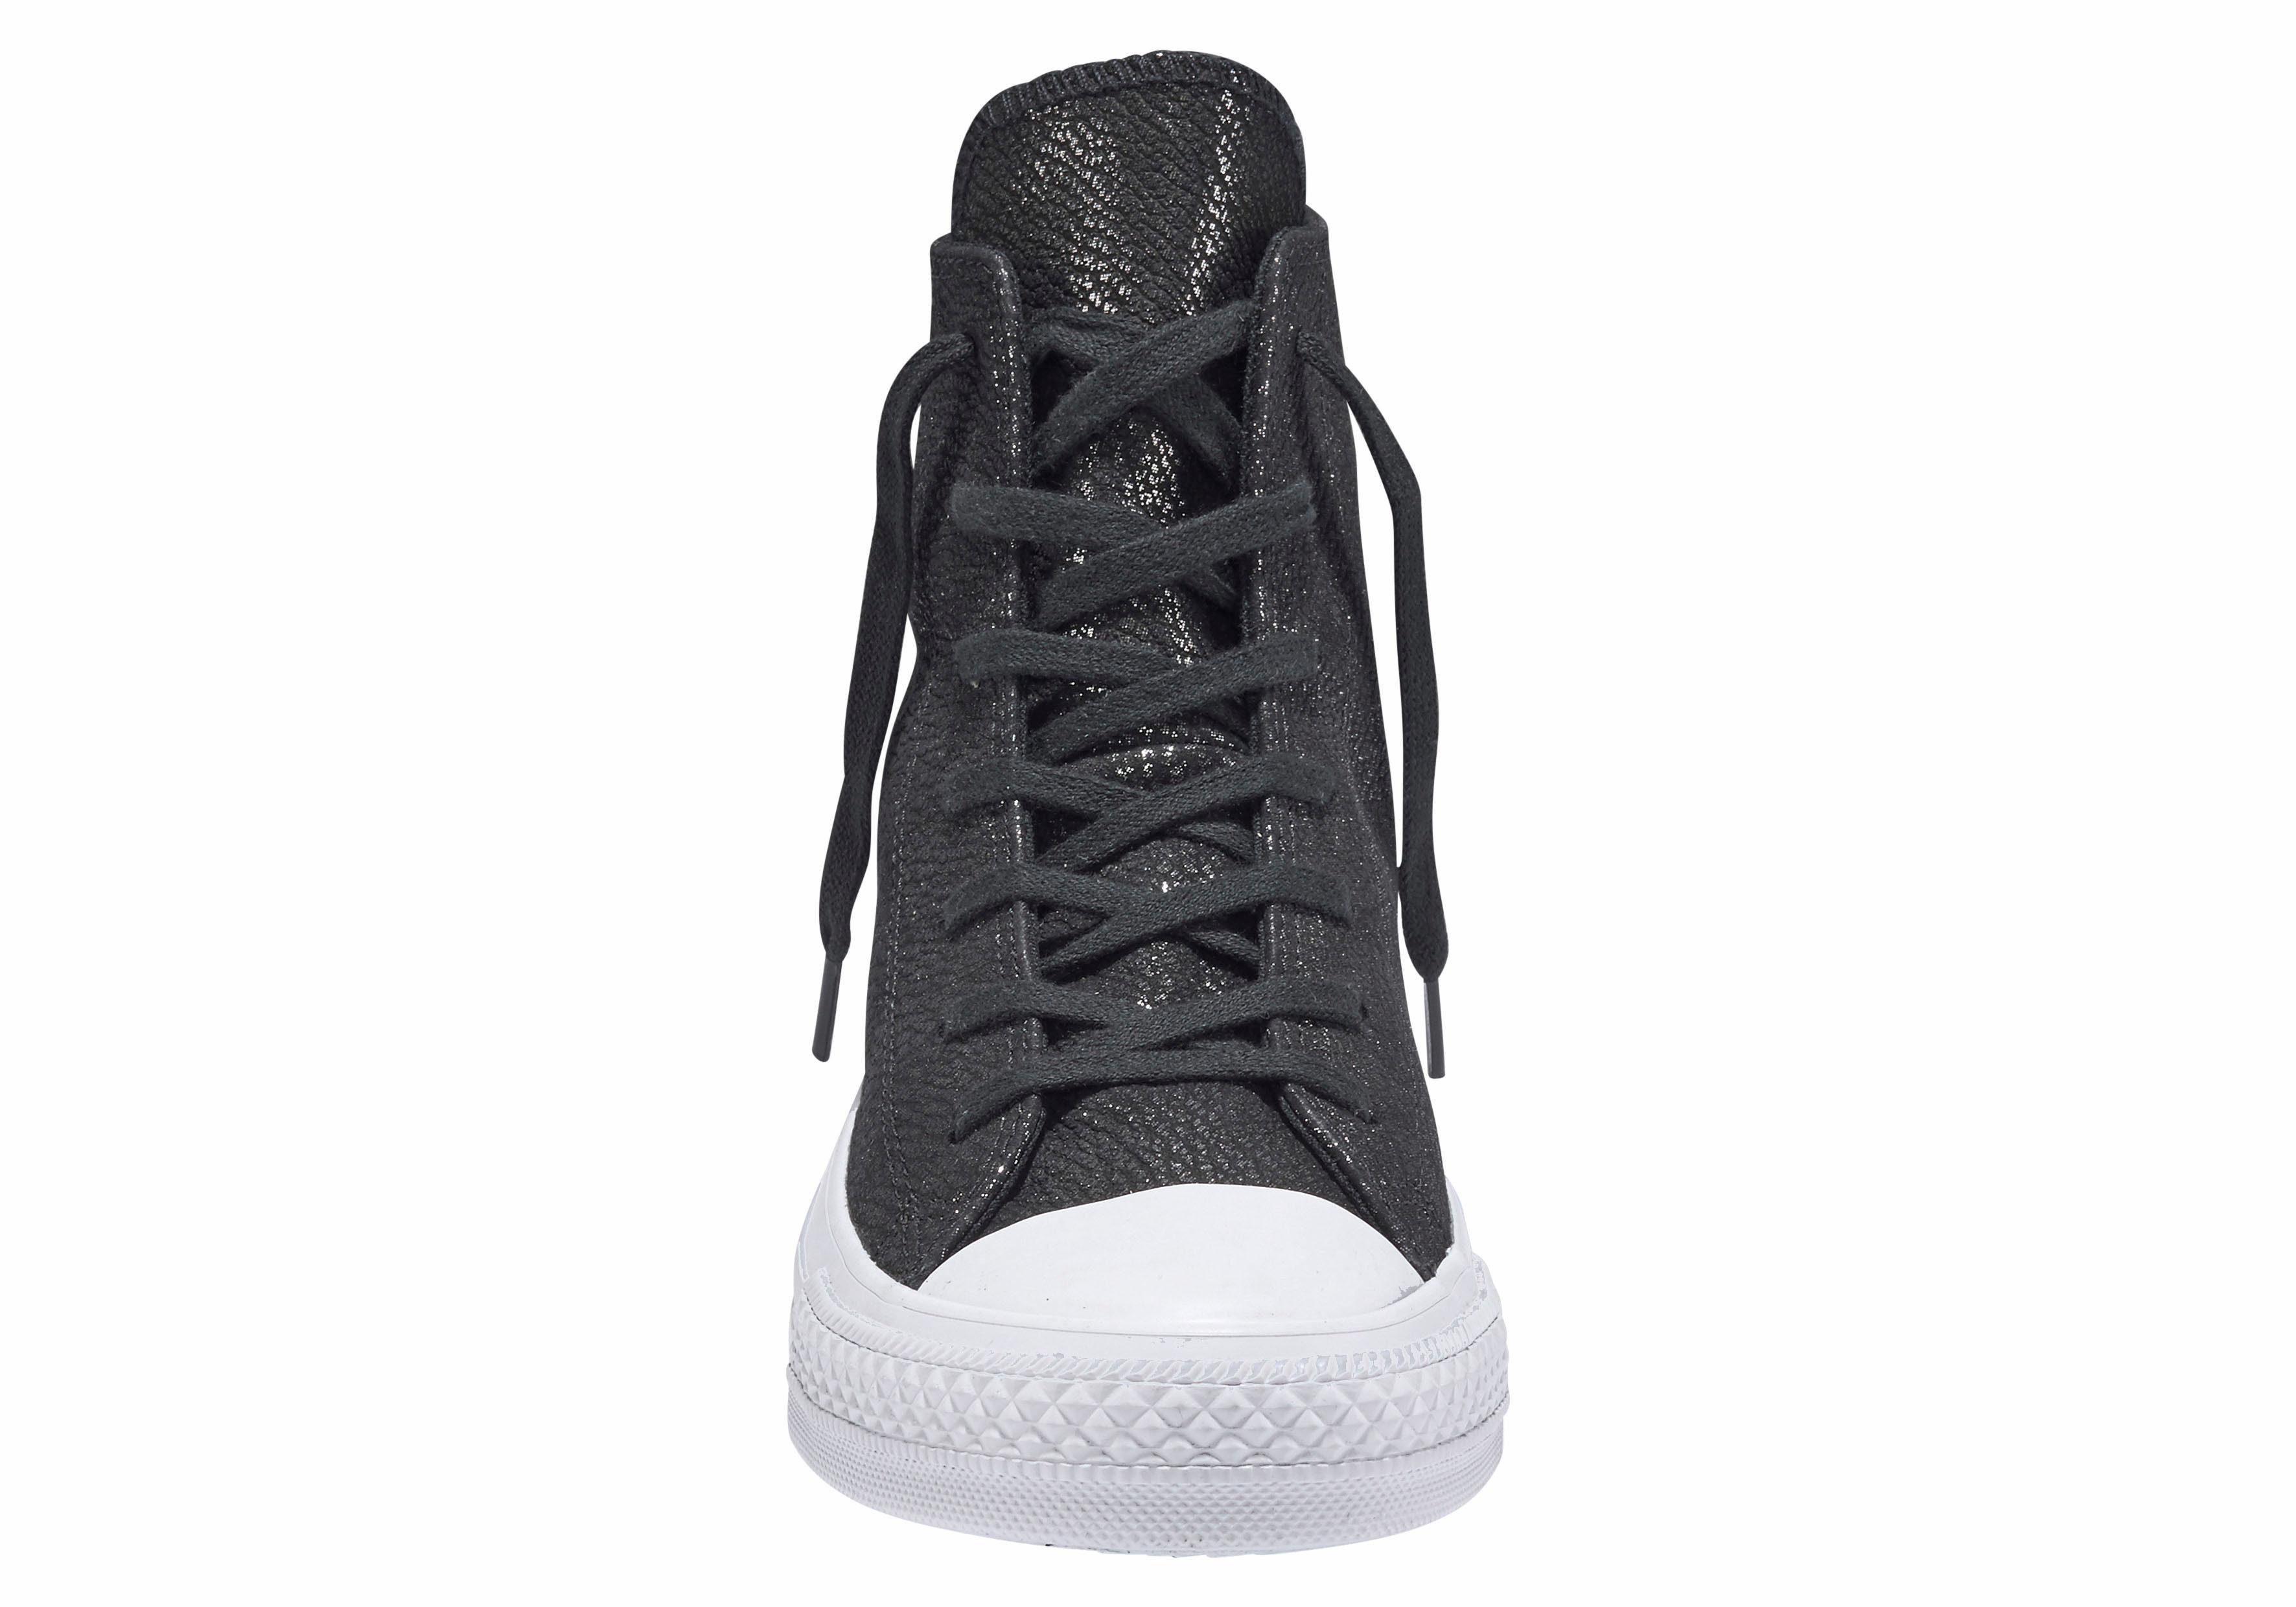 Converse Chuck Taylor All Star Hi Shiny Uppper Sneaker online kaufen  schwarz-silberfarben